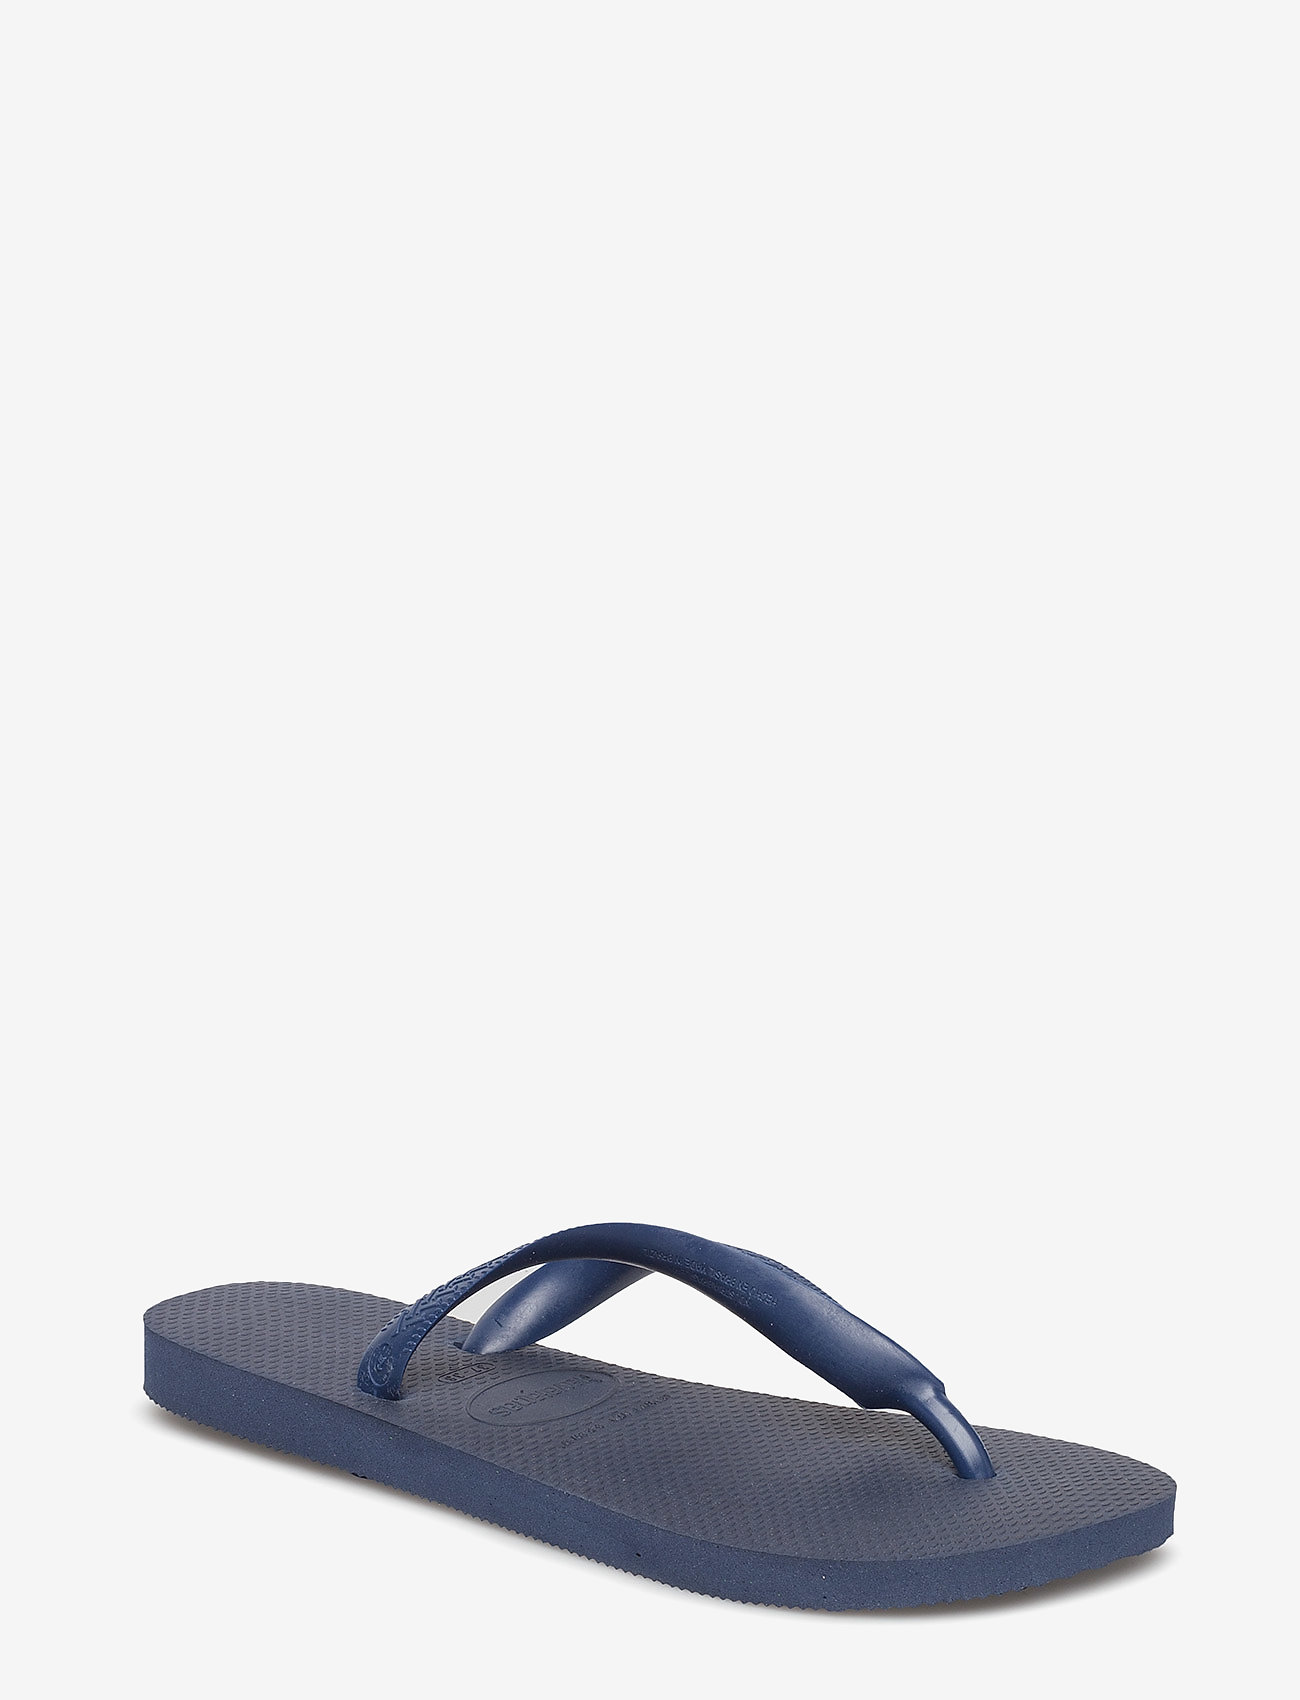 Havaianas - Top - teen slippers - navy blue 0555 - 0